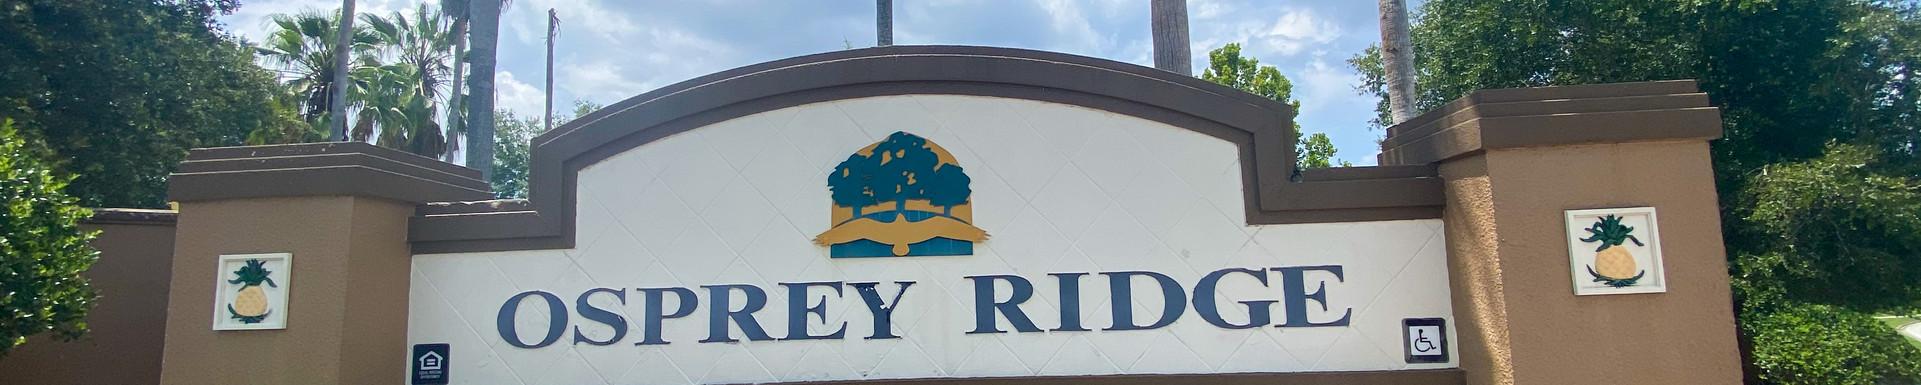 Osprey Ridge Monument Sign